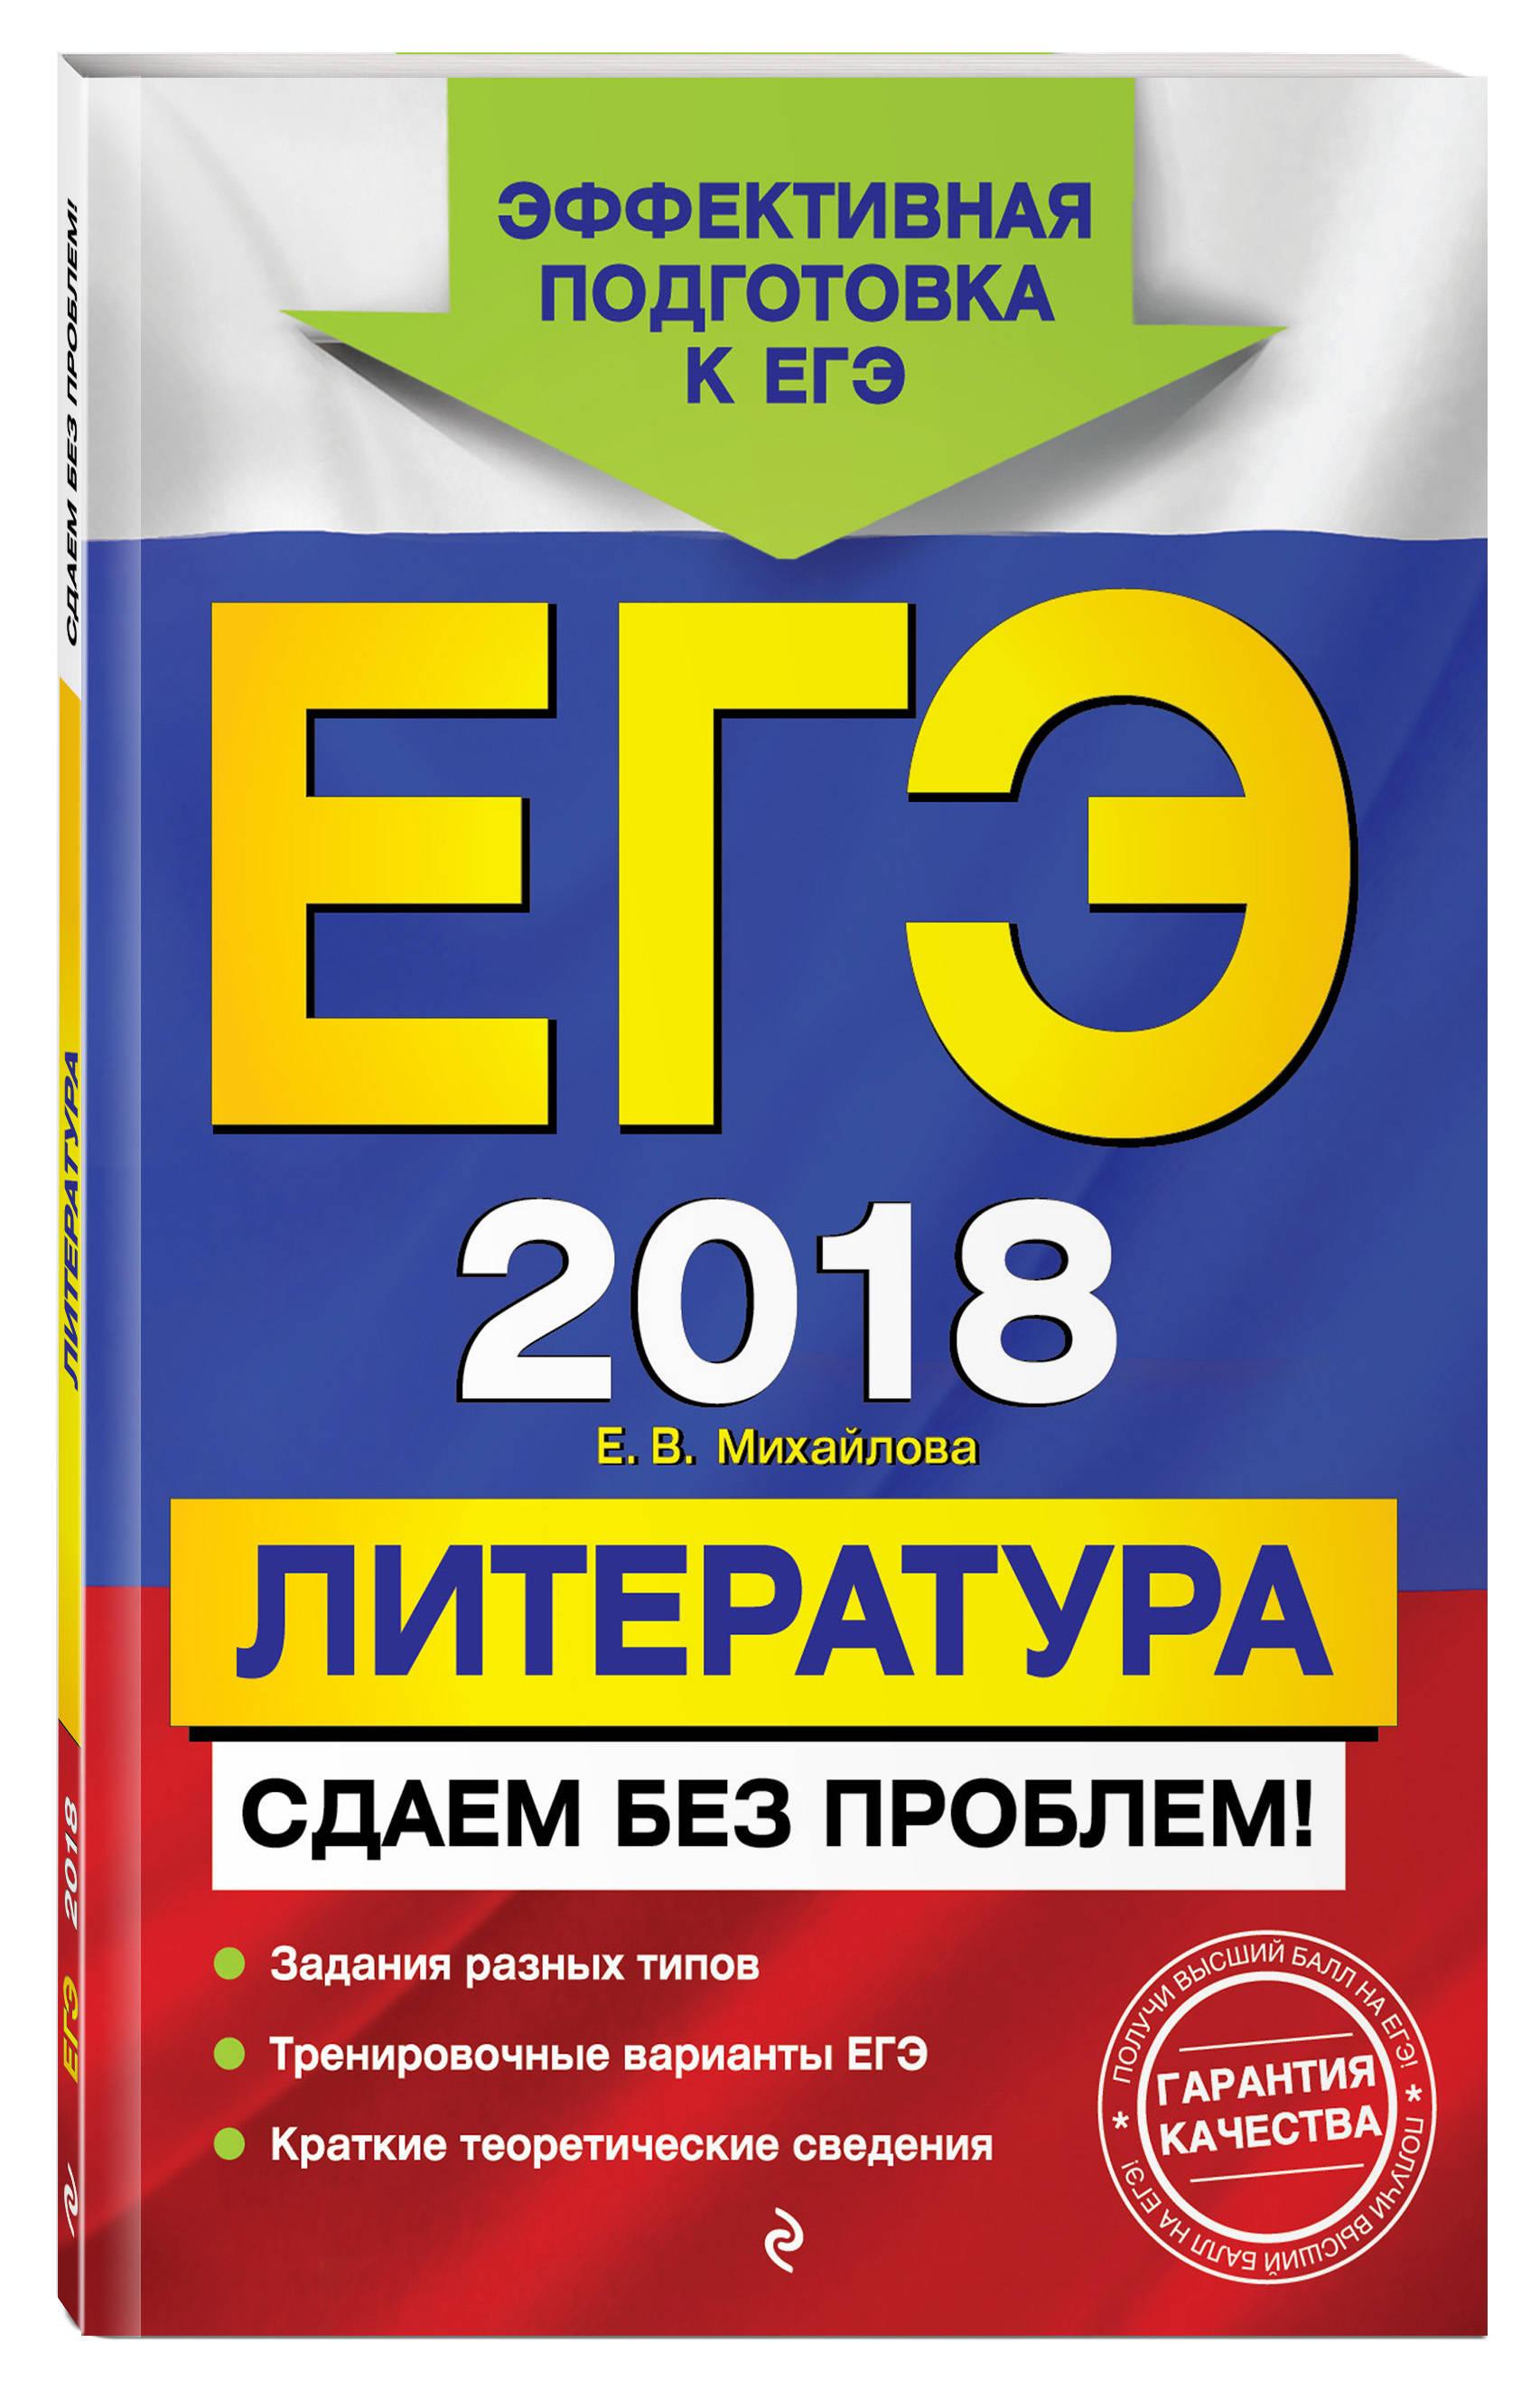 ЕГЭ-2018. Литература. Сдаем без проблем! ( Михайлова Е.В.  )